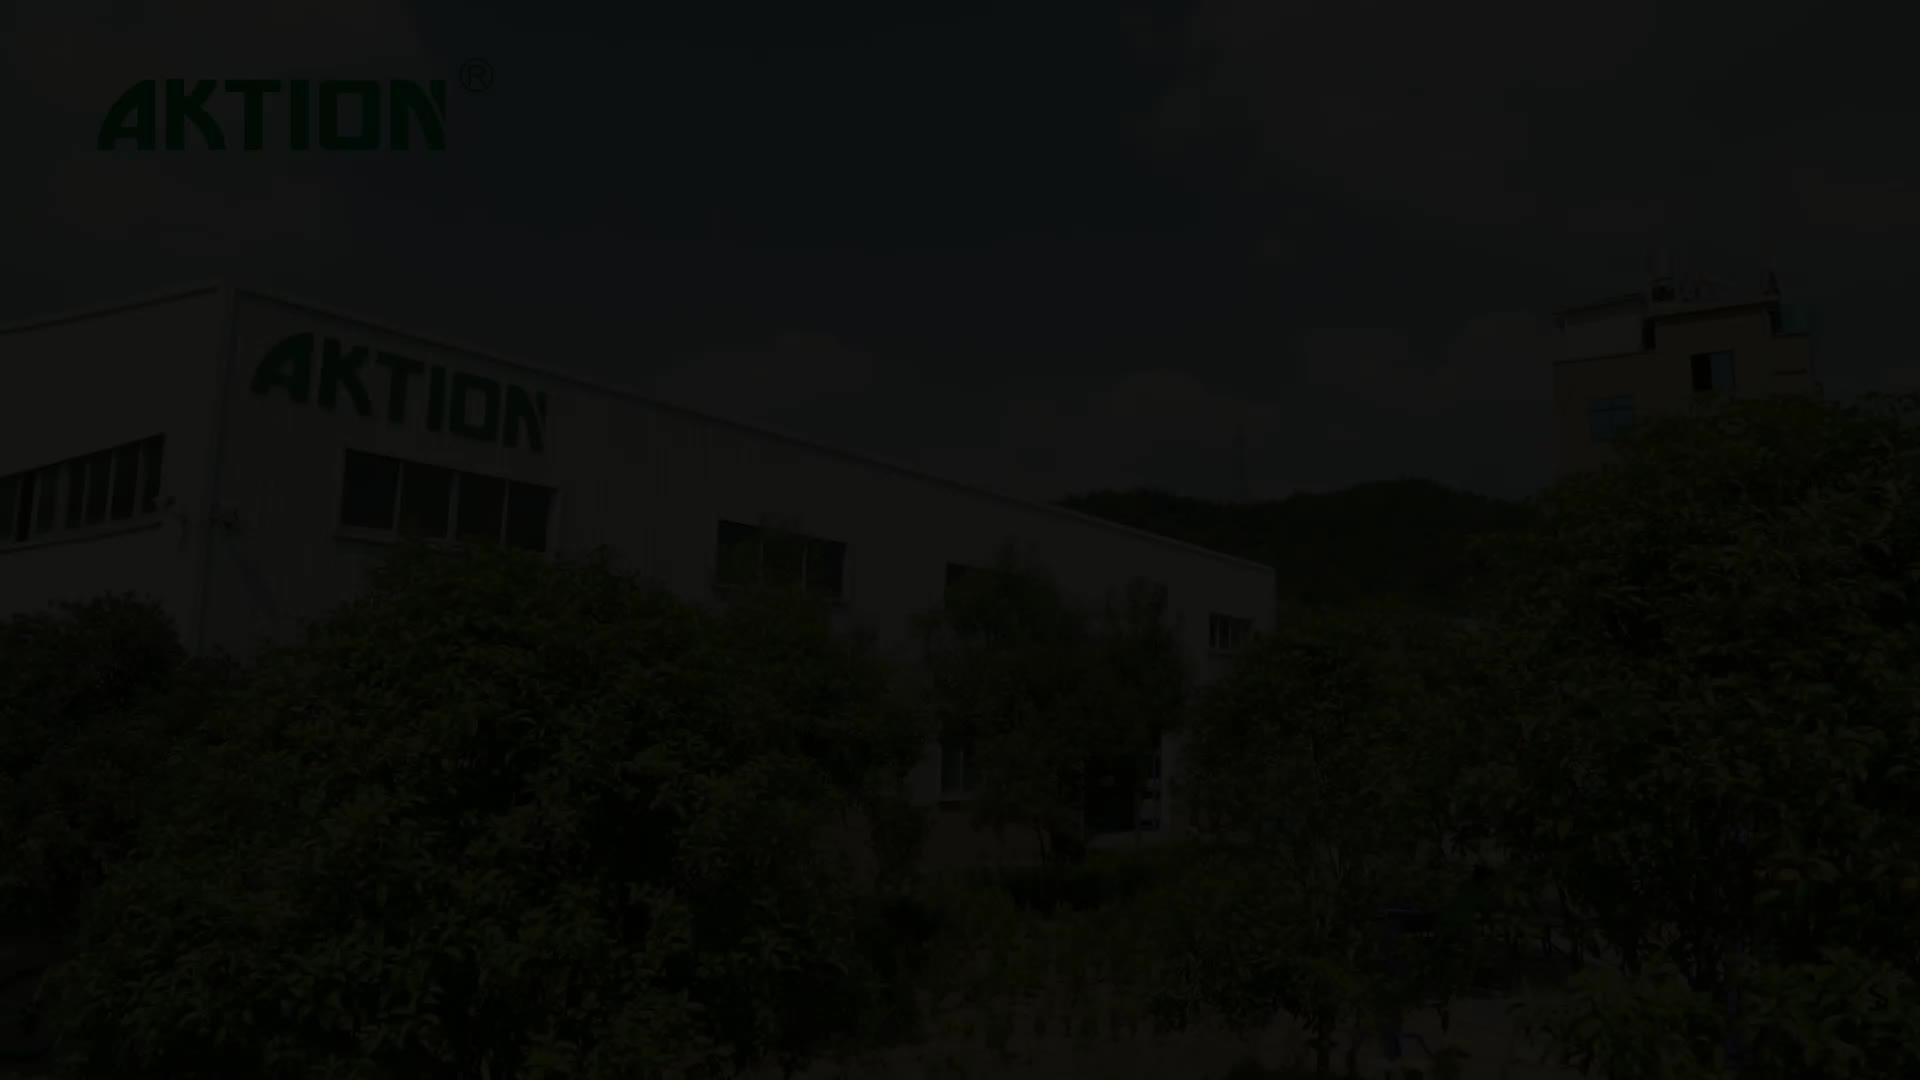 Isviçre Kaliteli ESD-14 anti-statik paslanmaz çelik cımbız Düz Sivri Forseps Aktion Marka